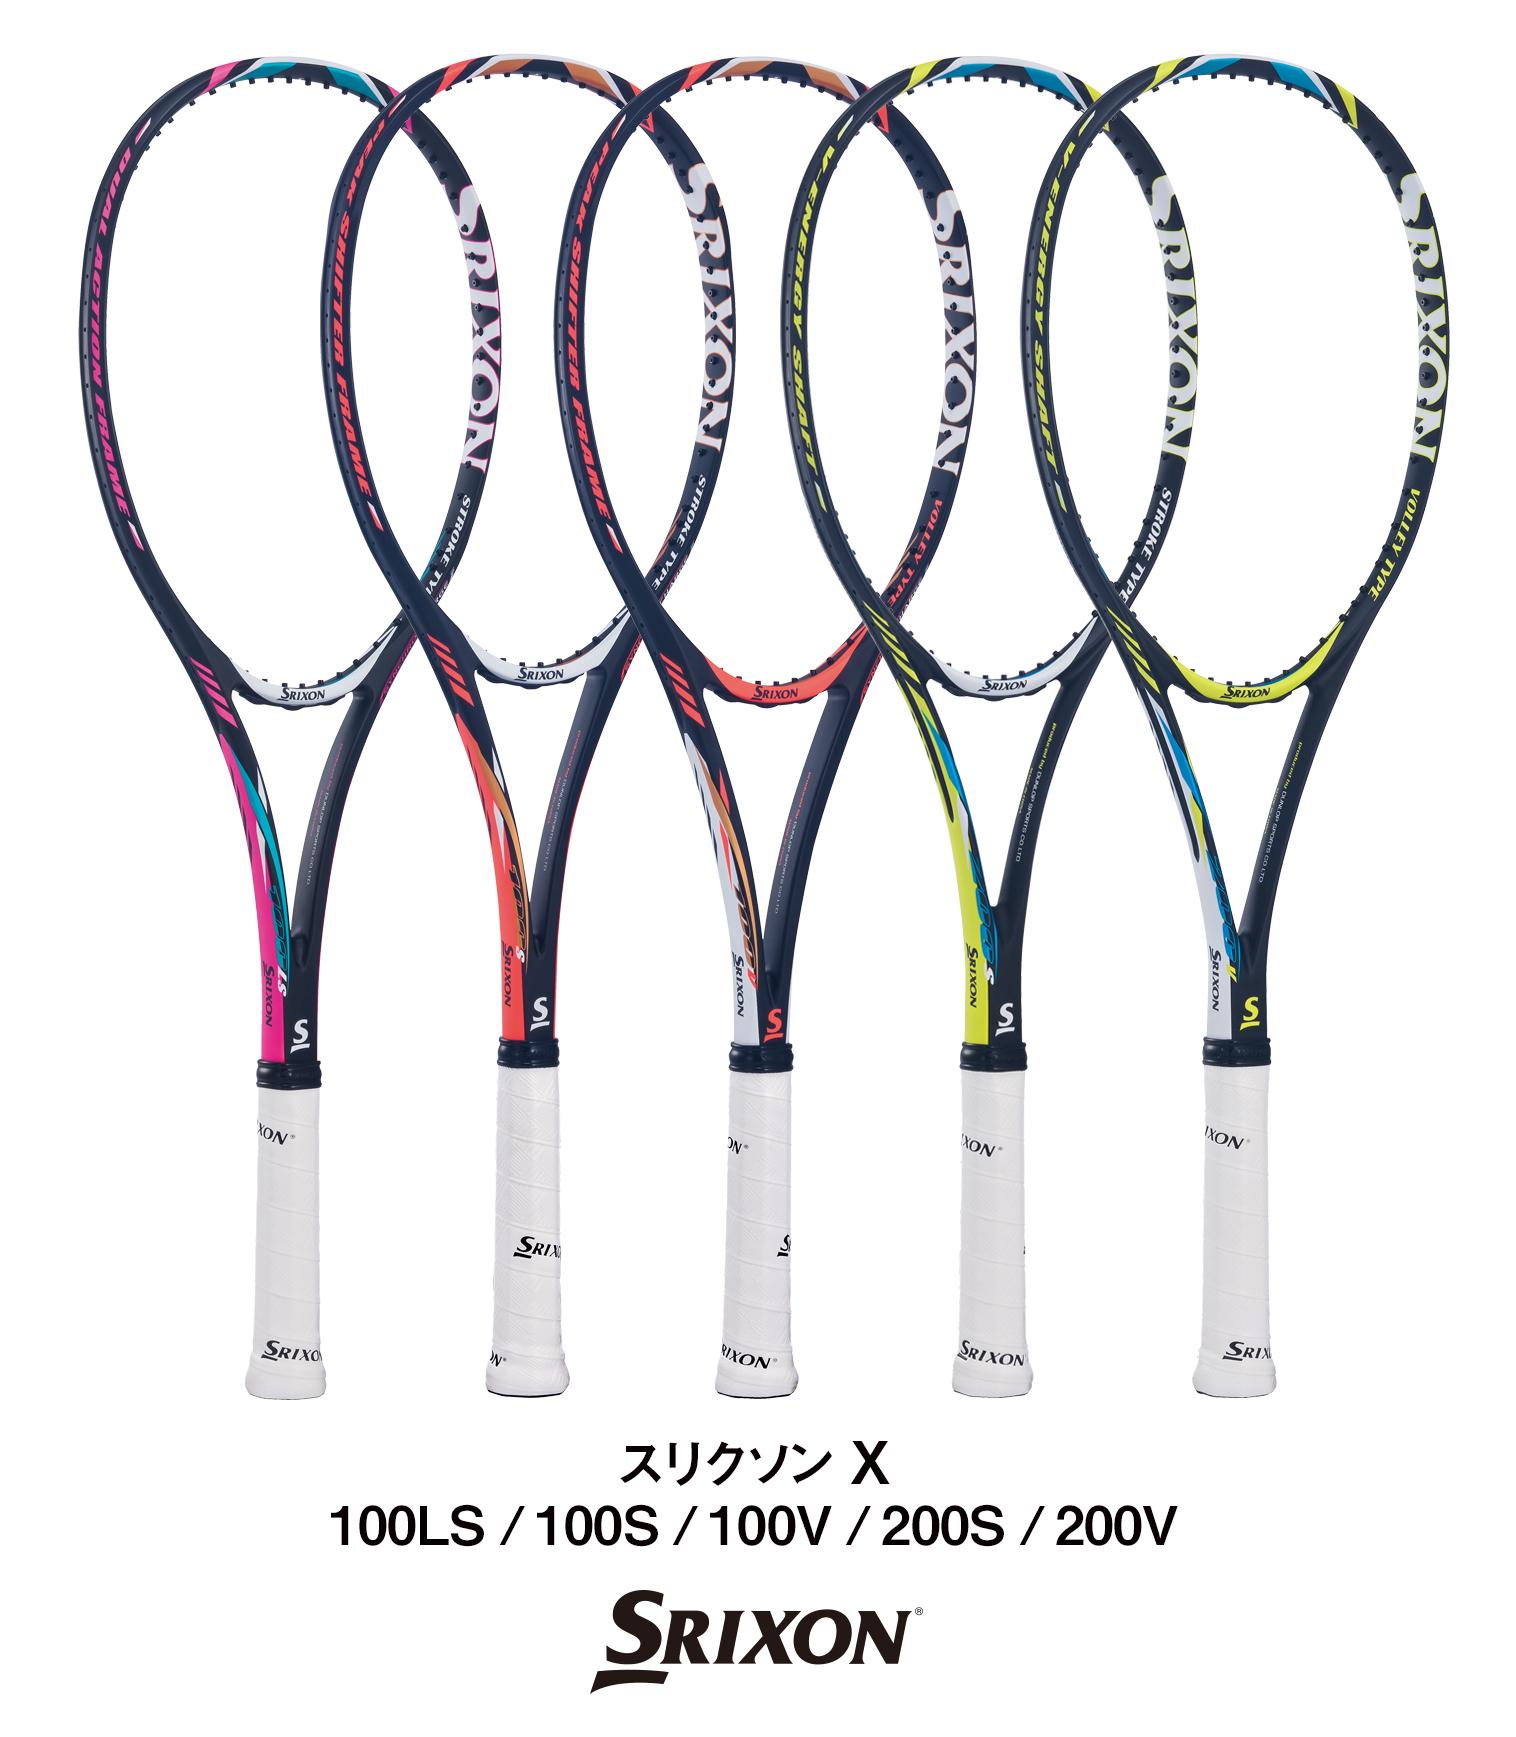 0e02bee56345ae ソフトテニスラケット「スリクソン X」シリーズを新発売|ダンロップ ...